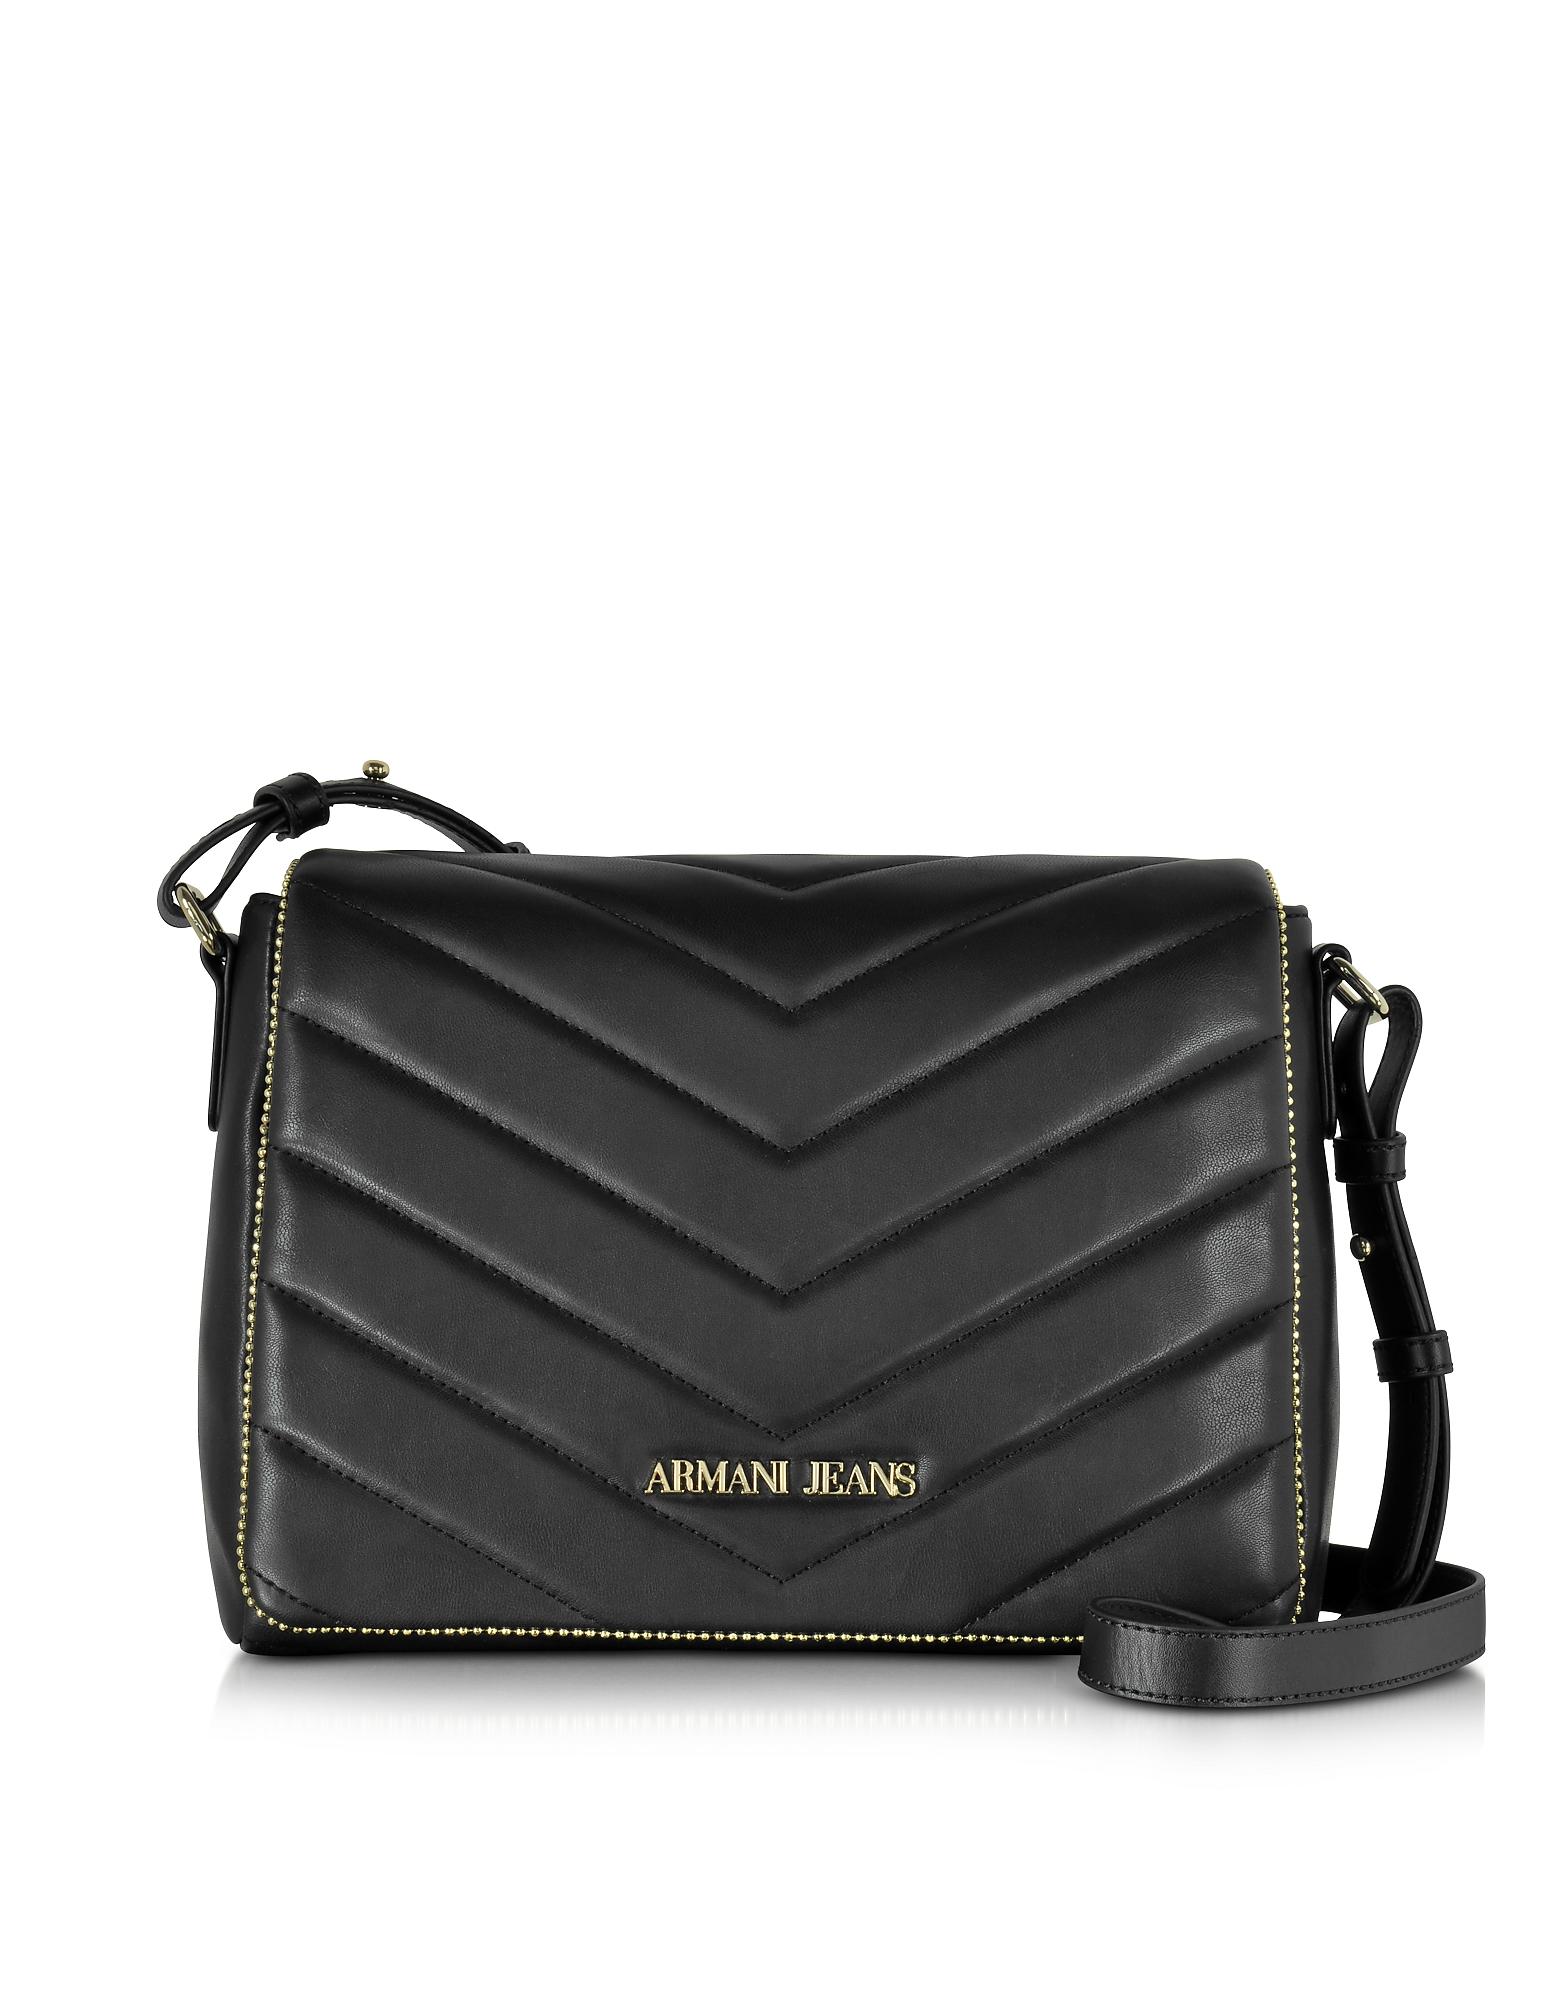 Armani Jeans Handbags, Black Faux Leather Crossbody